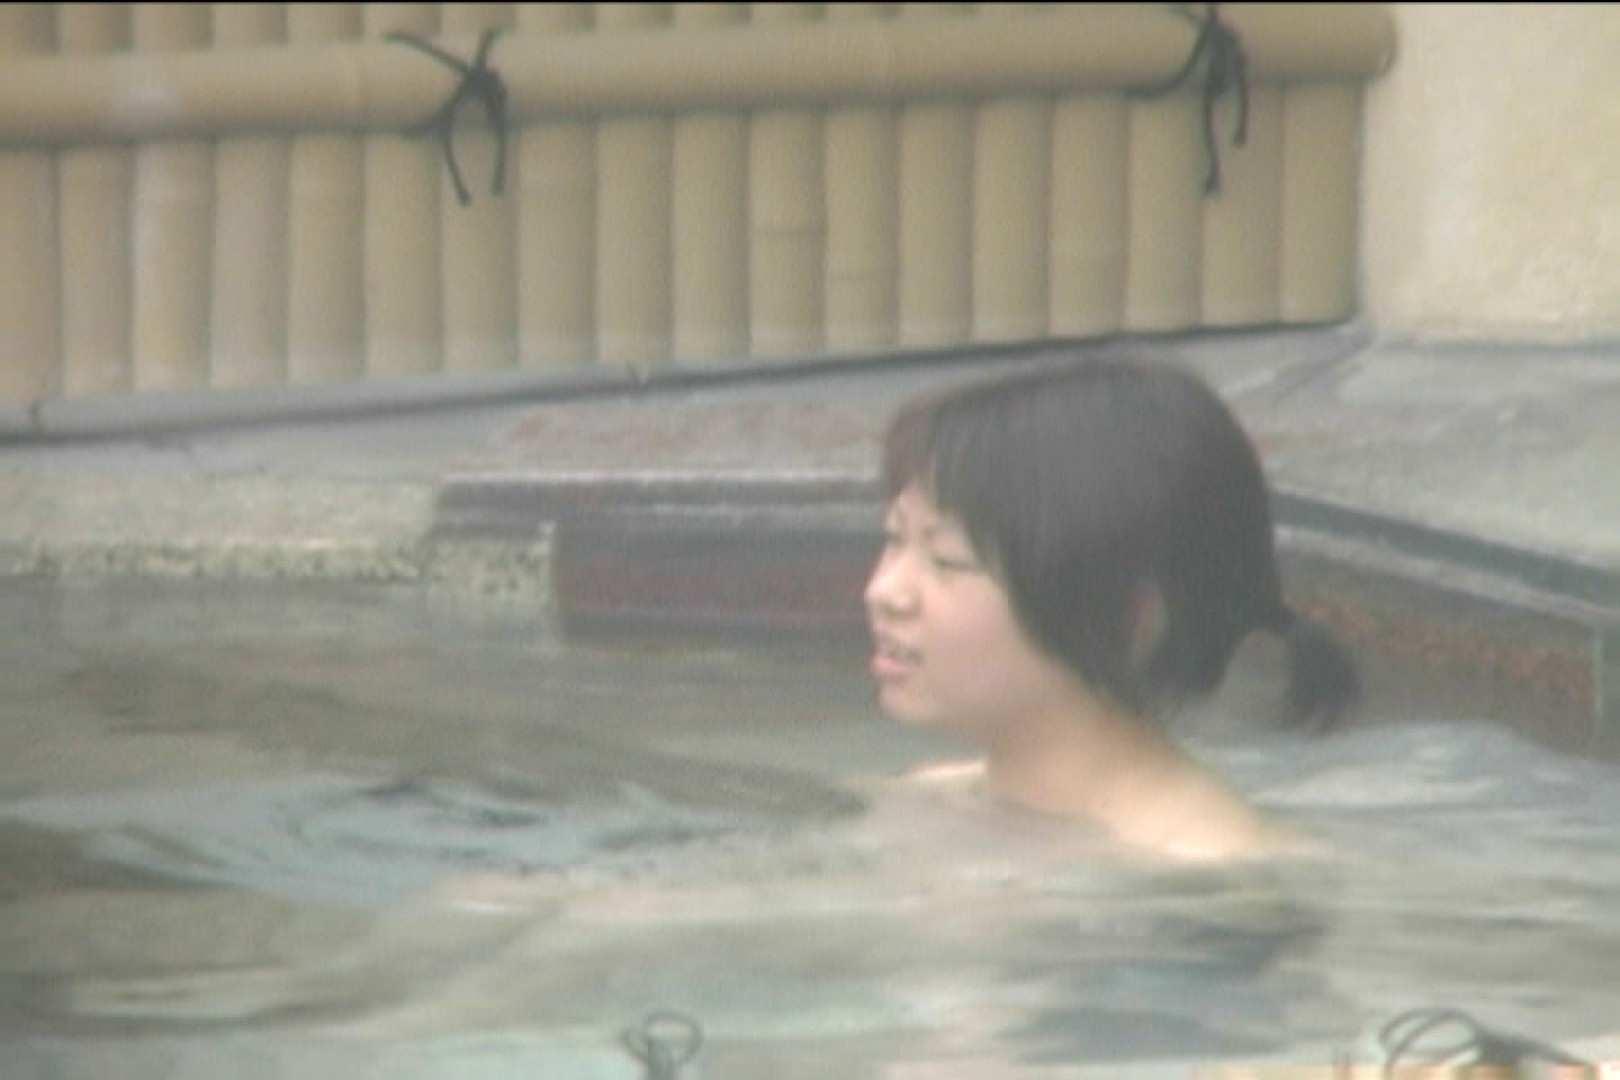 Aquaな露天風呂Vol.141 盗撮特撮 おまんこ動画流出 13pic 8